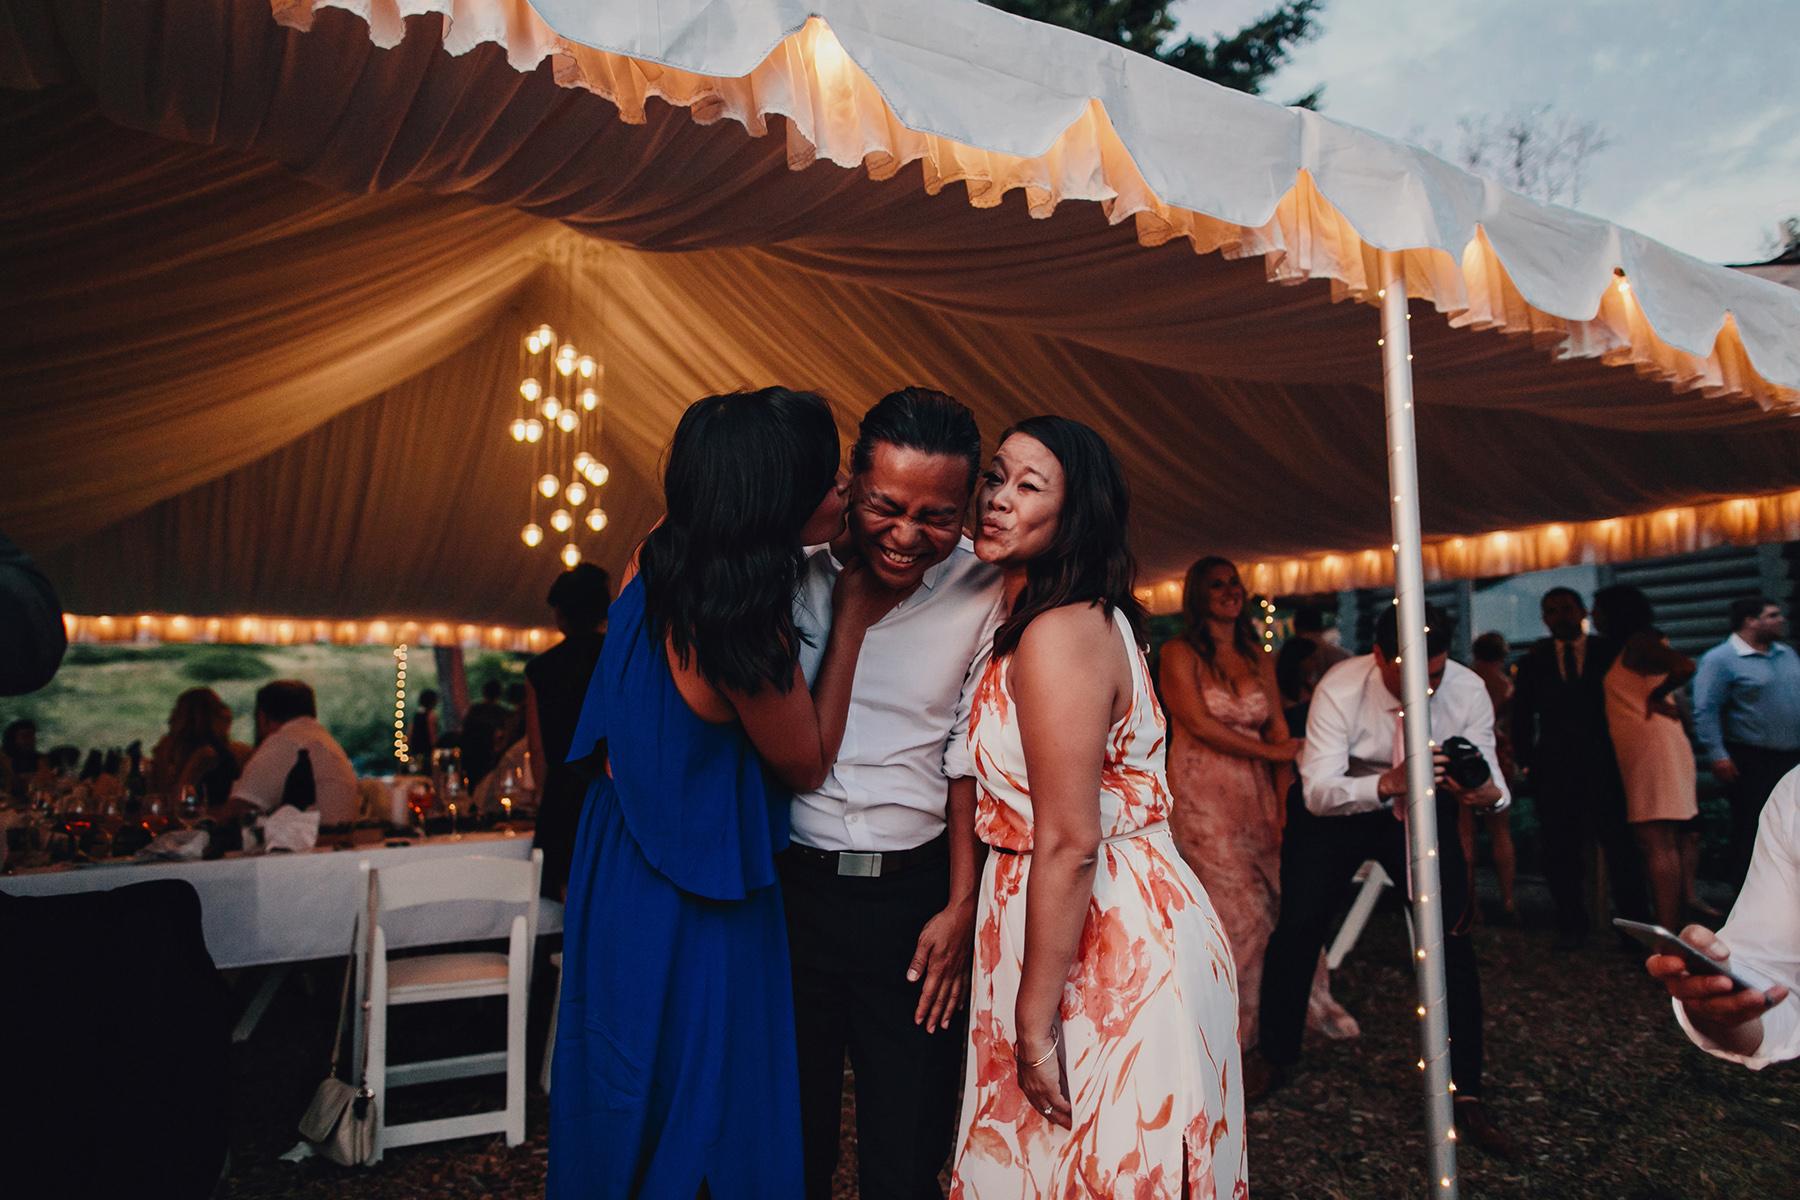 bodega-ridge-wedding-photos-0122.jpg